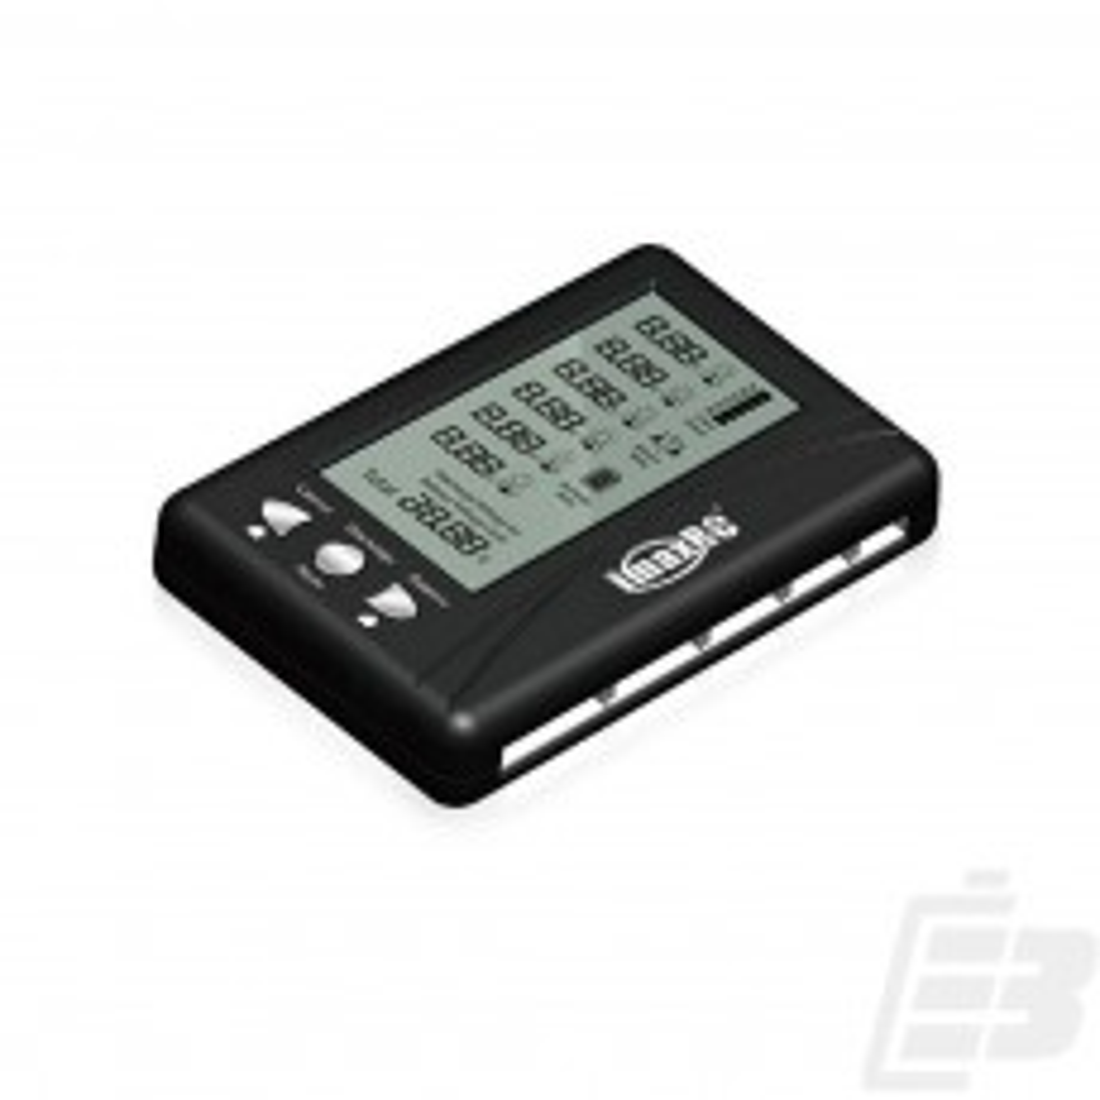 iMaxRC 3in1 METER Cell Voltage Tester.jpg (70.15 kB)